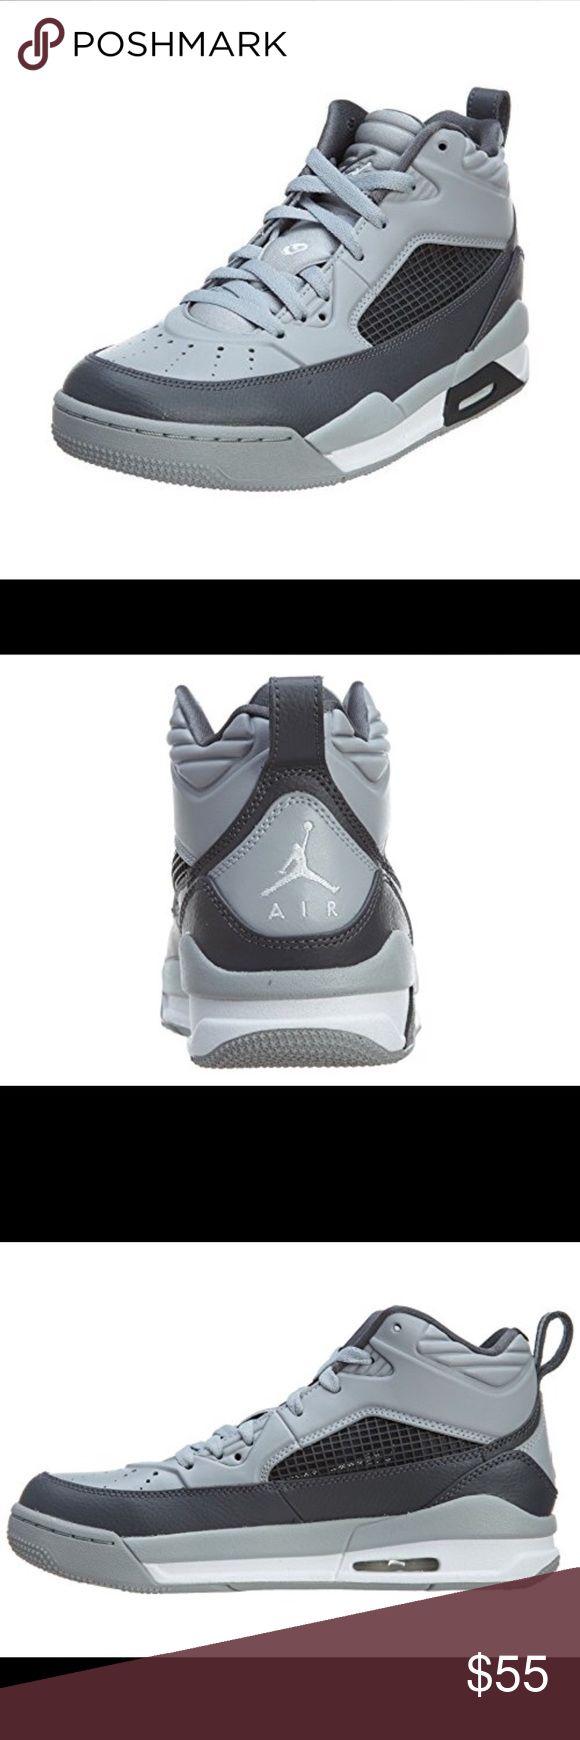 Jordan flight 9.5 Brand new never worn size 7y Air Jordan Shoes Sneakers